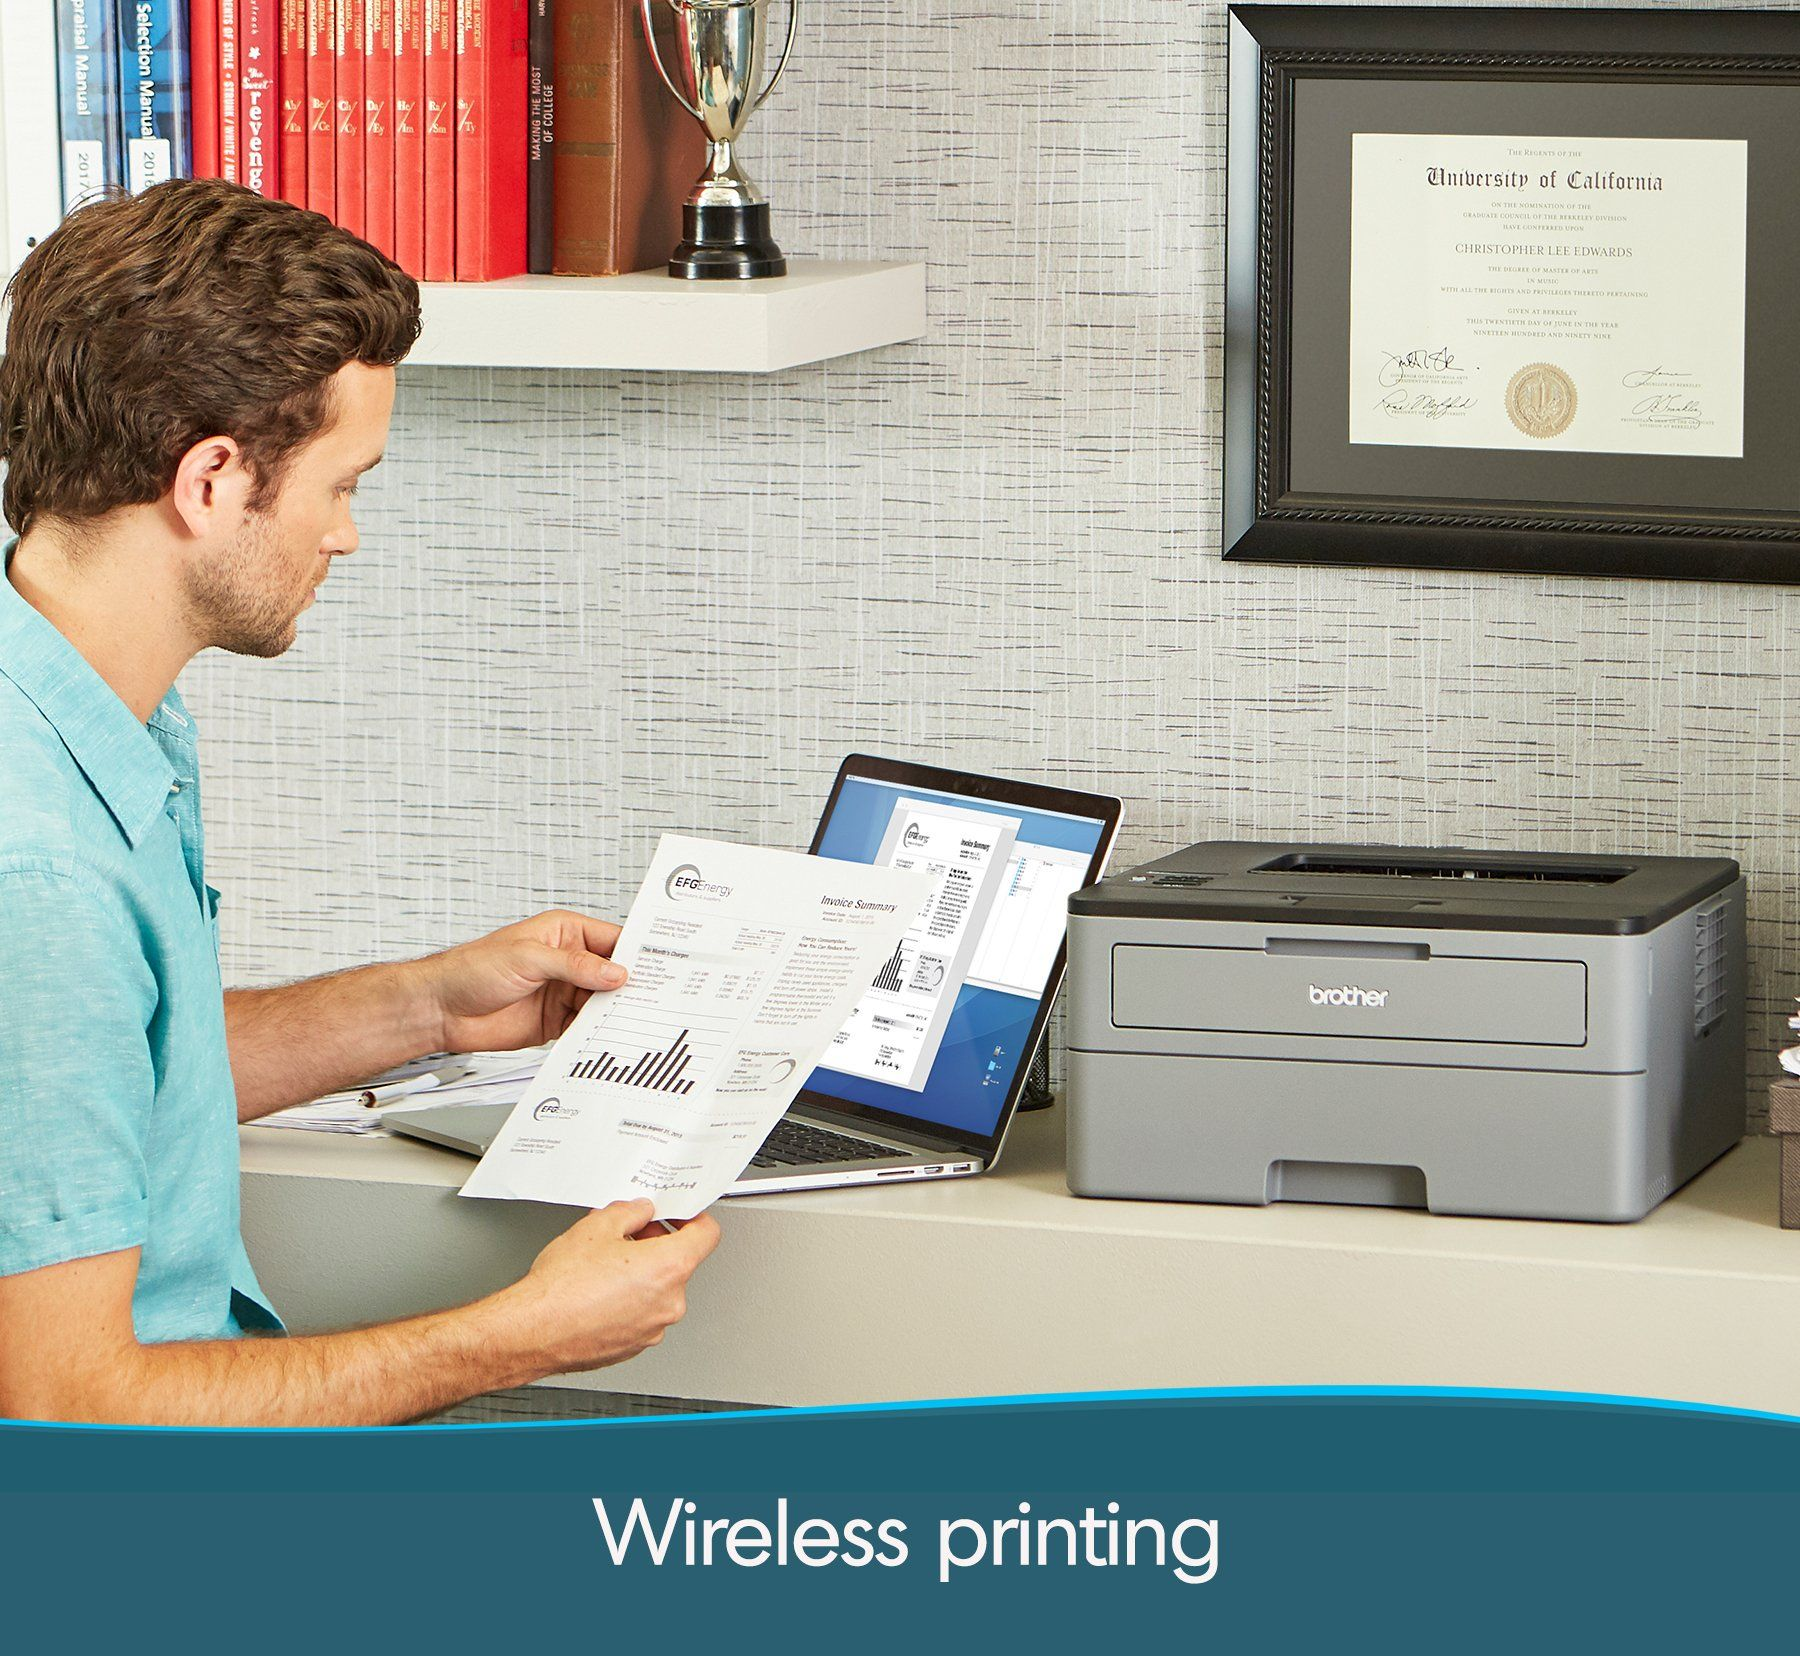 Brother Compact Monochrome Laser Printer Hll2350dw Wireless Printing Duplex Twosided Printing Amazon Dash Replenishment Enable Laser Printer Printer Monochrome